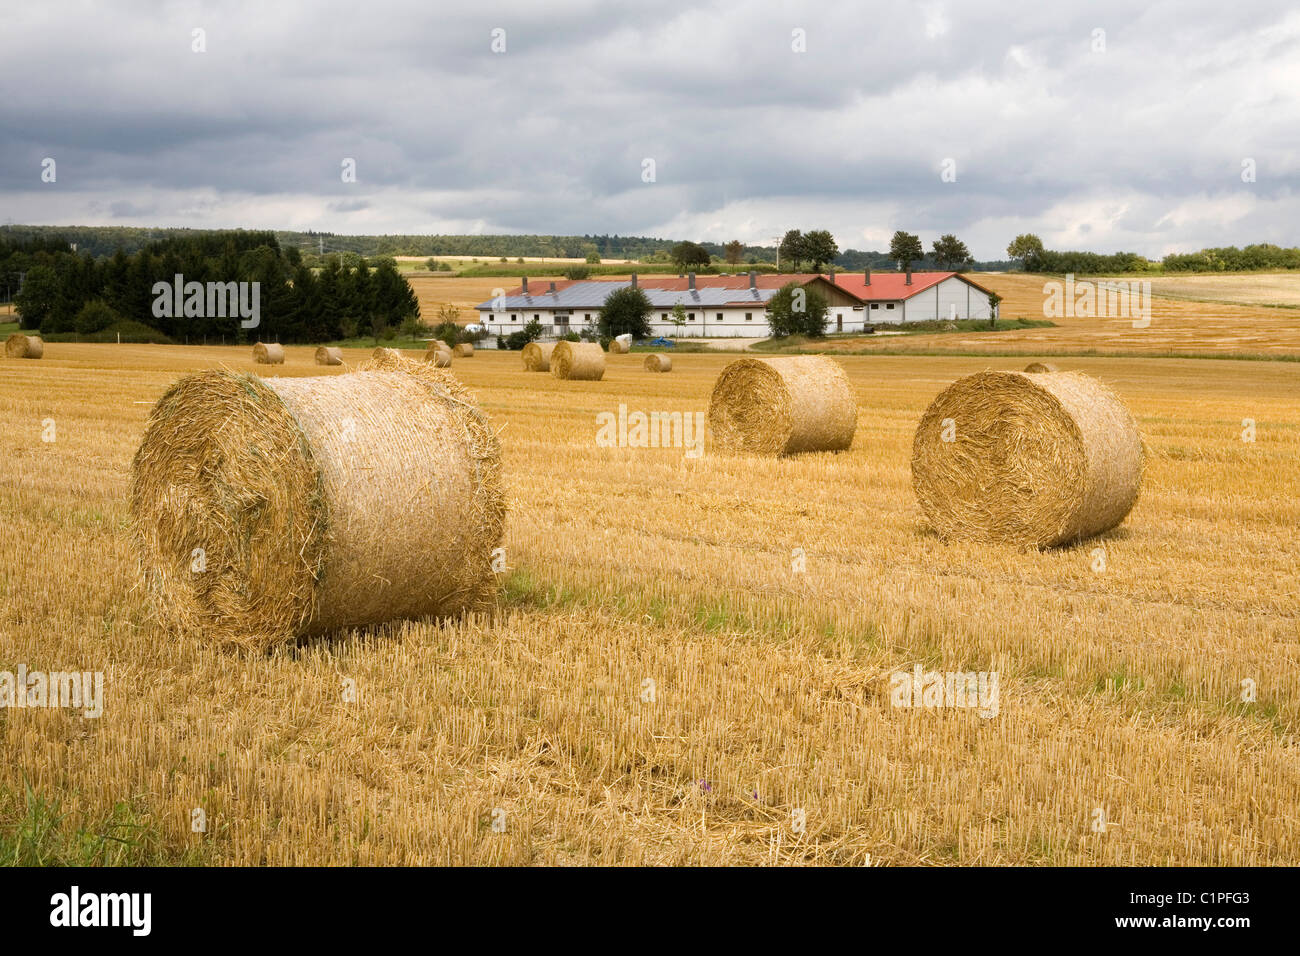 Germany, Bavaria, hay bales in field - Stock Image